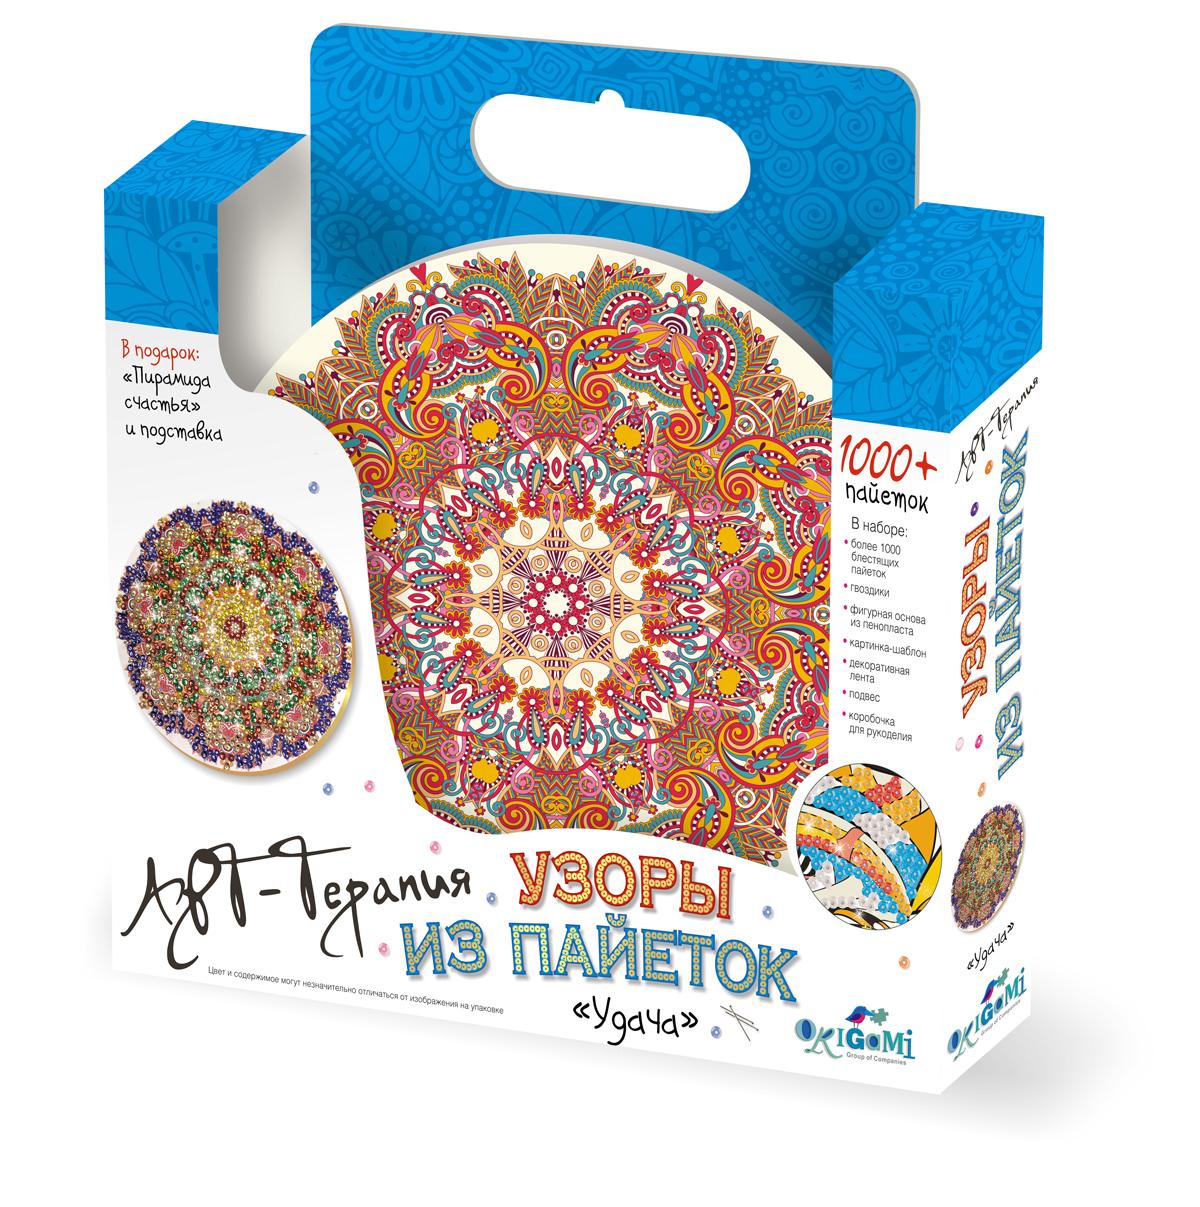 Арт-терапия. Узоры из пайеток (1000+ пайеток). Удача. Арт. 02713 наборы для поделок origami origami арт терапия узоры из пайеток 1000 пайеток тигр